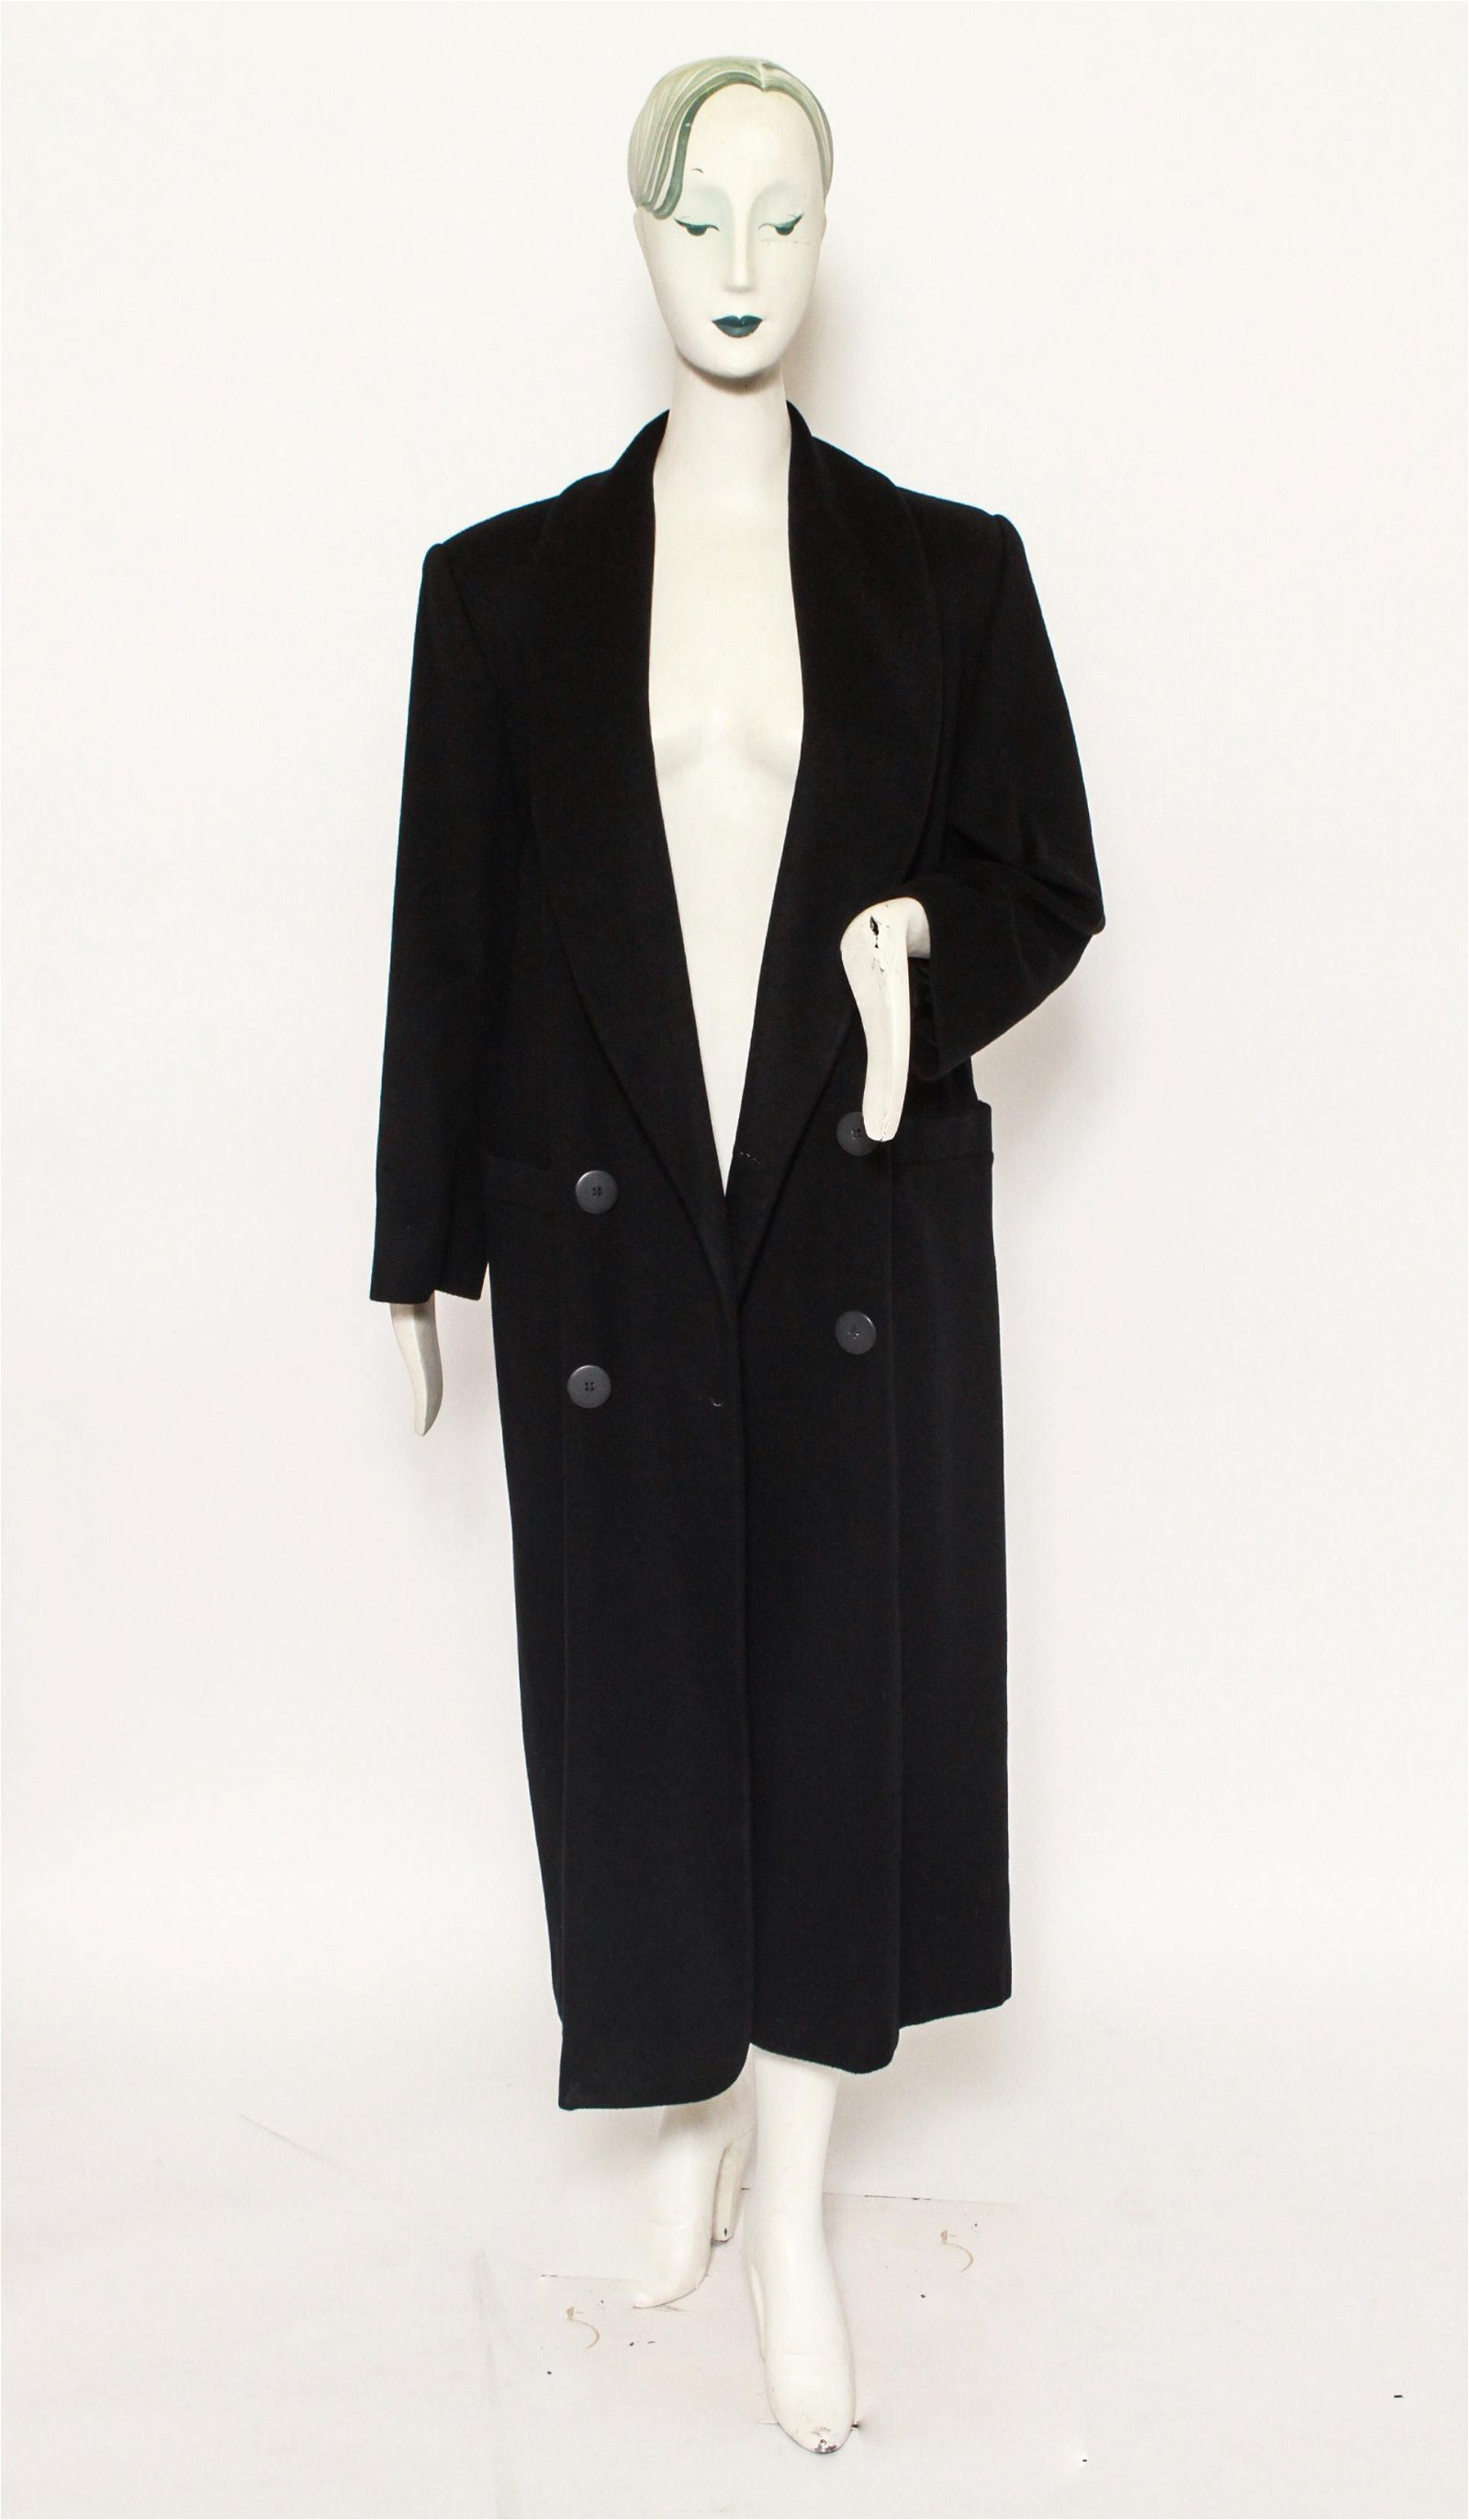 Chrisian Dior Loro Piana Black Cashmere Long Coat